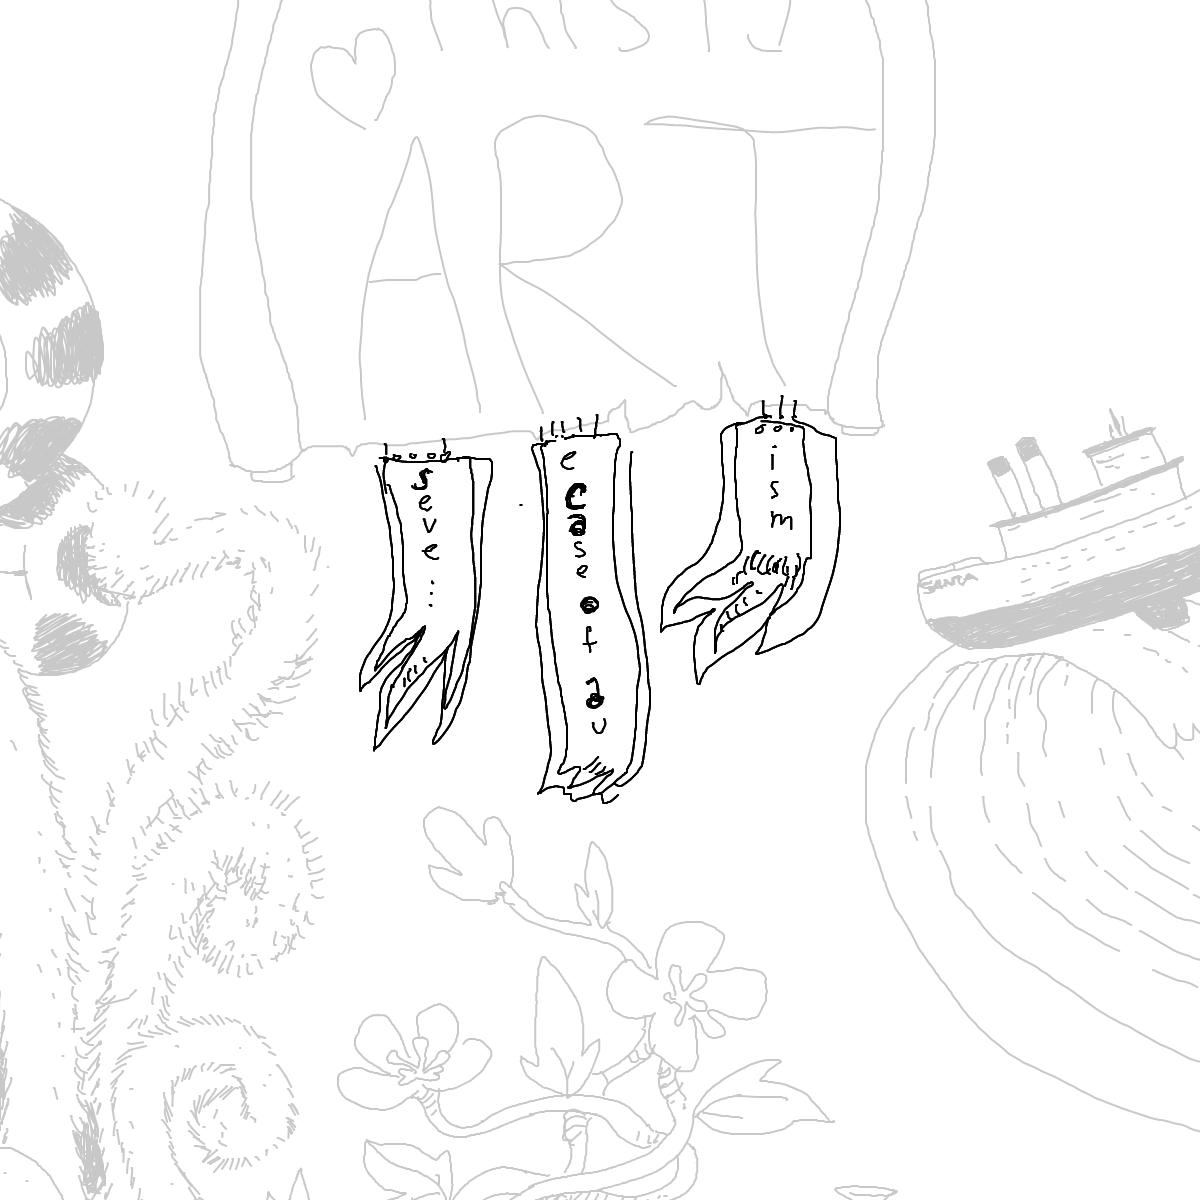 BAAAM drawing#7553 lat:78.4207611083984400lng: -4.4896383285522460